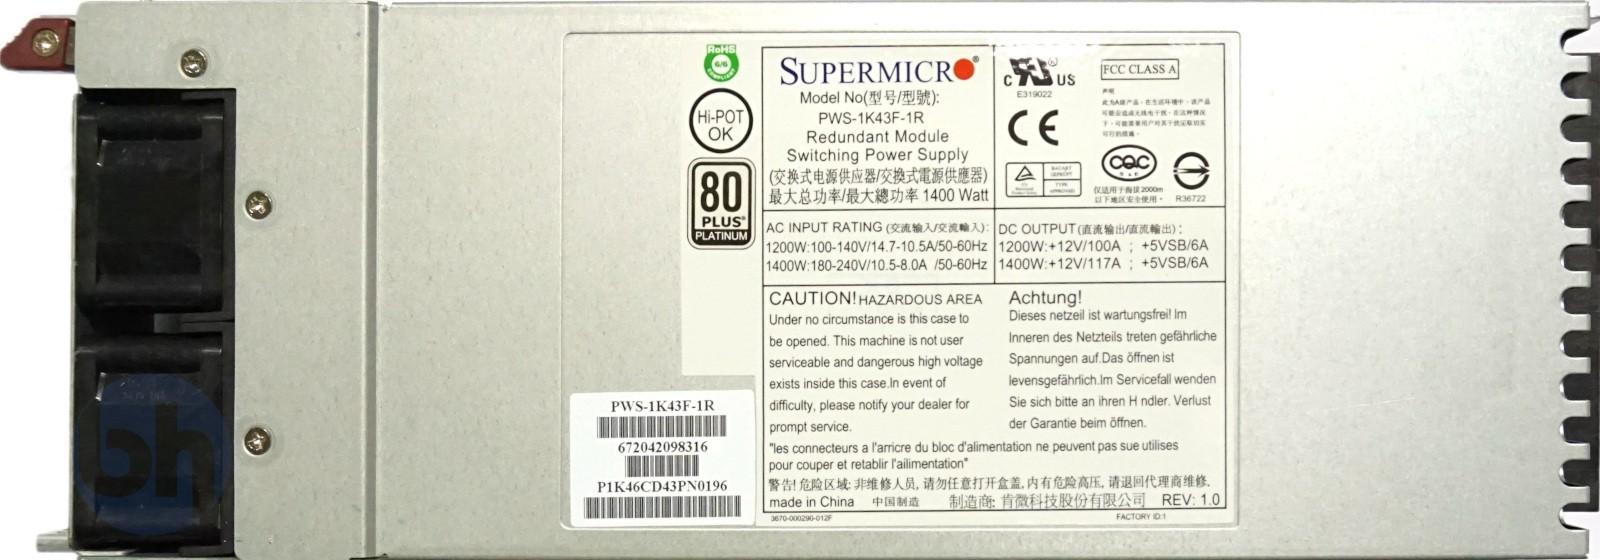 SuperMicro PWS-1K43F-1R 1400W 'Platinum' Hot-Swap PSU